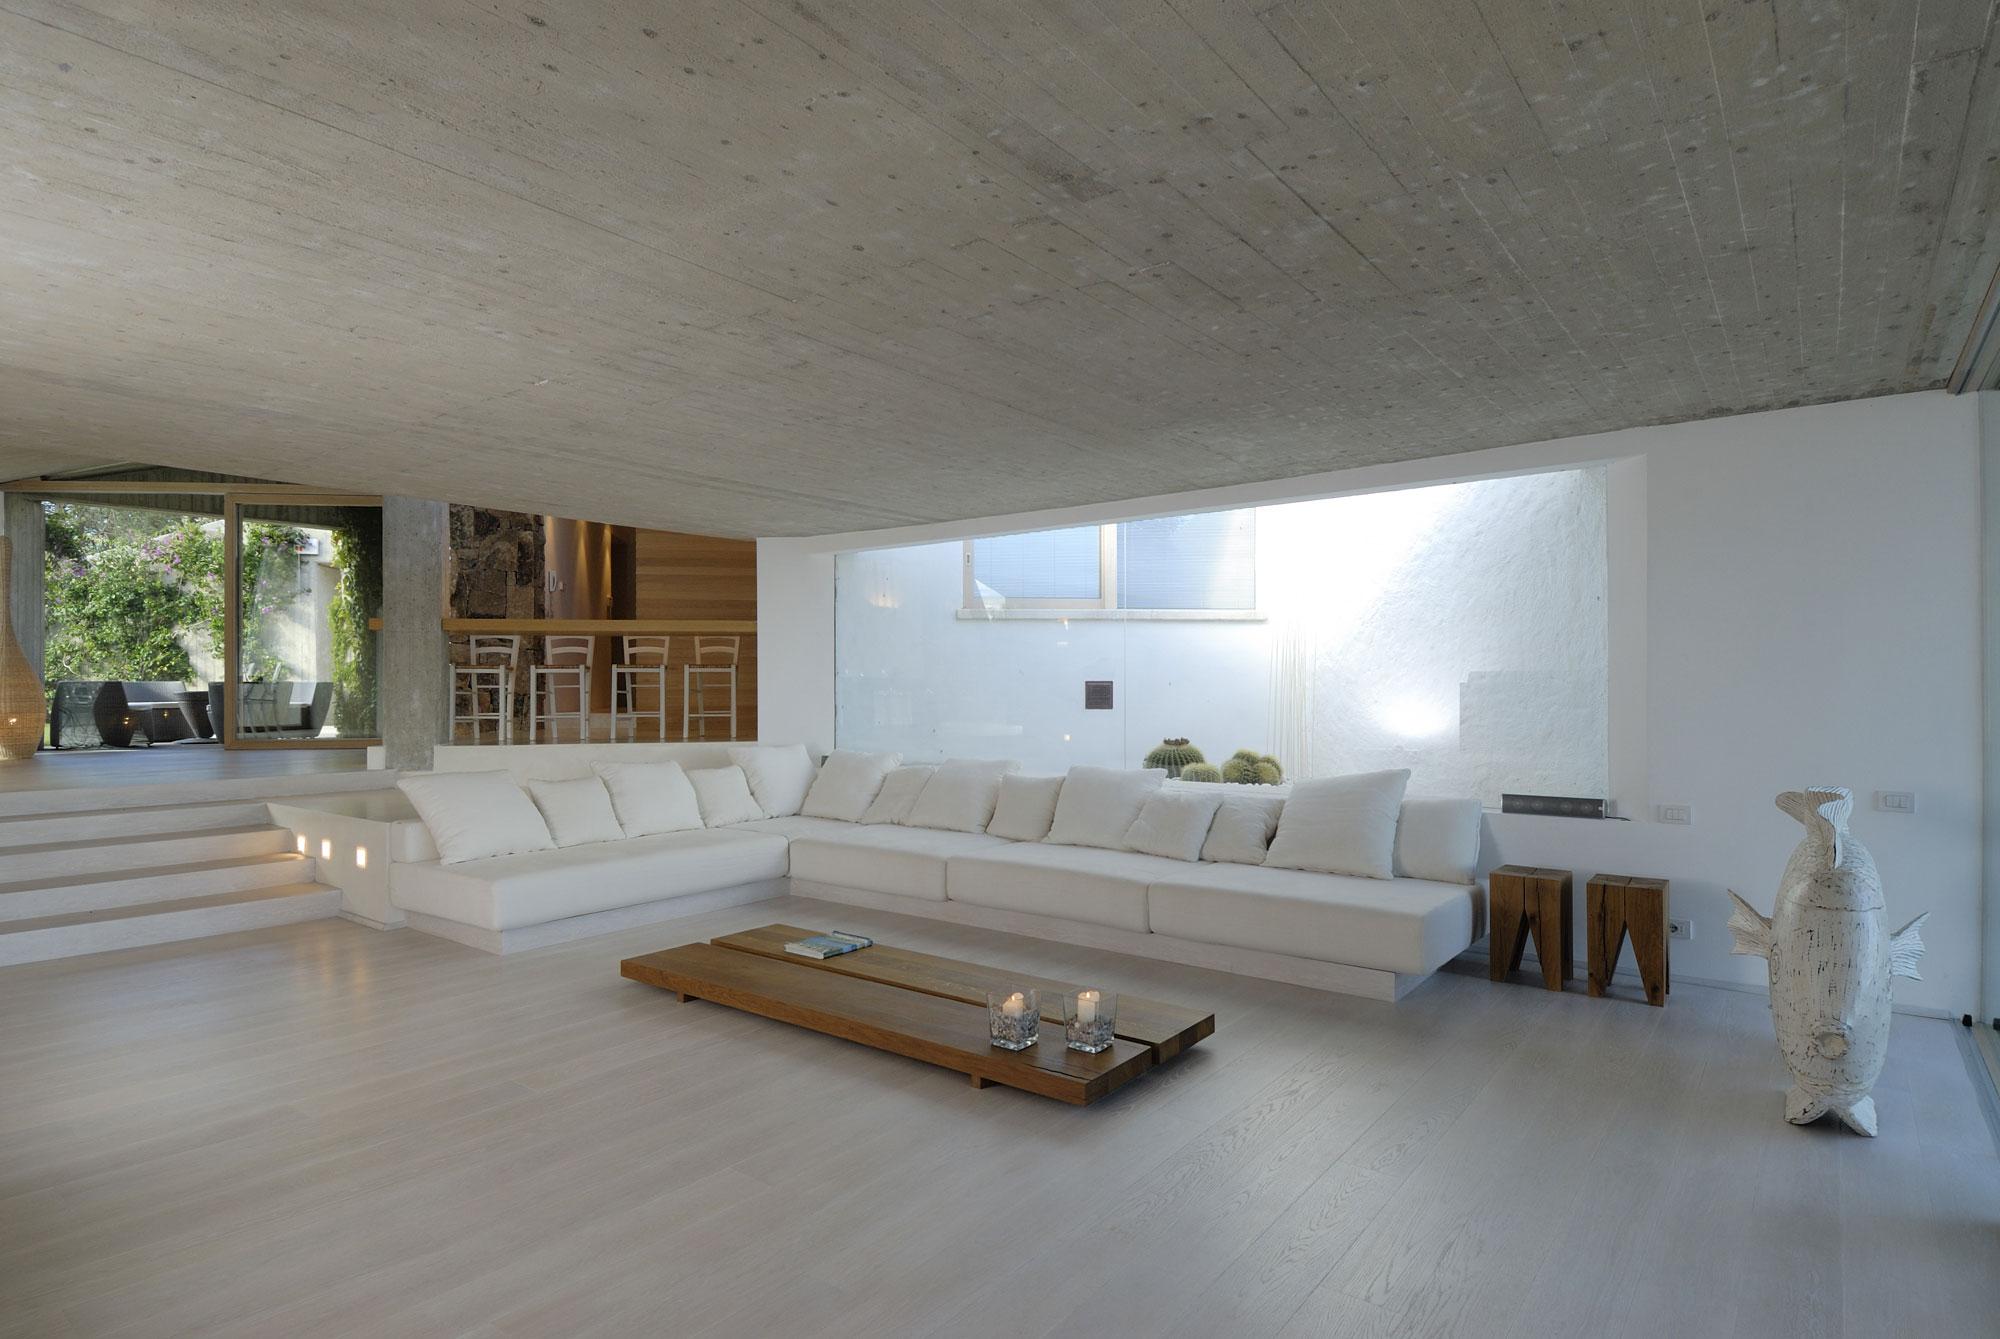 House-in-Sardinia-07